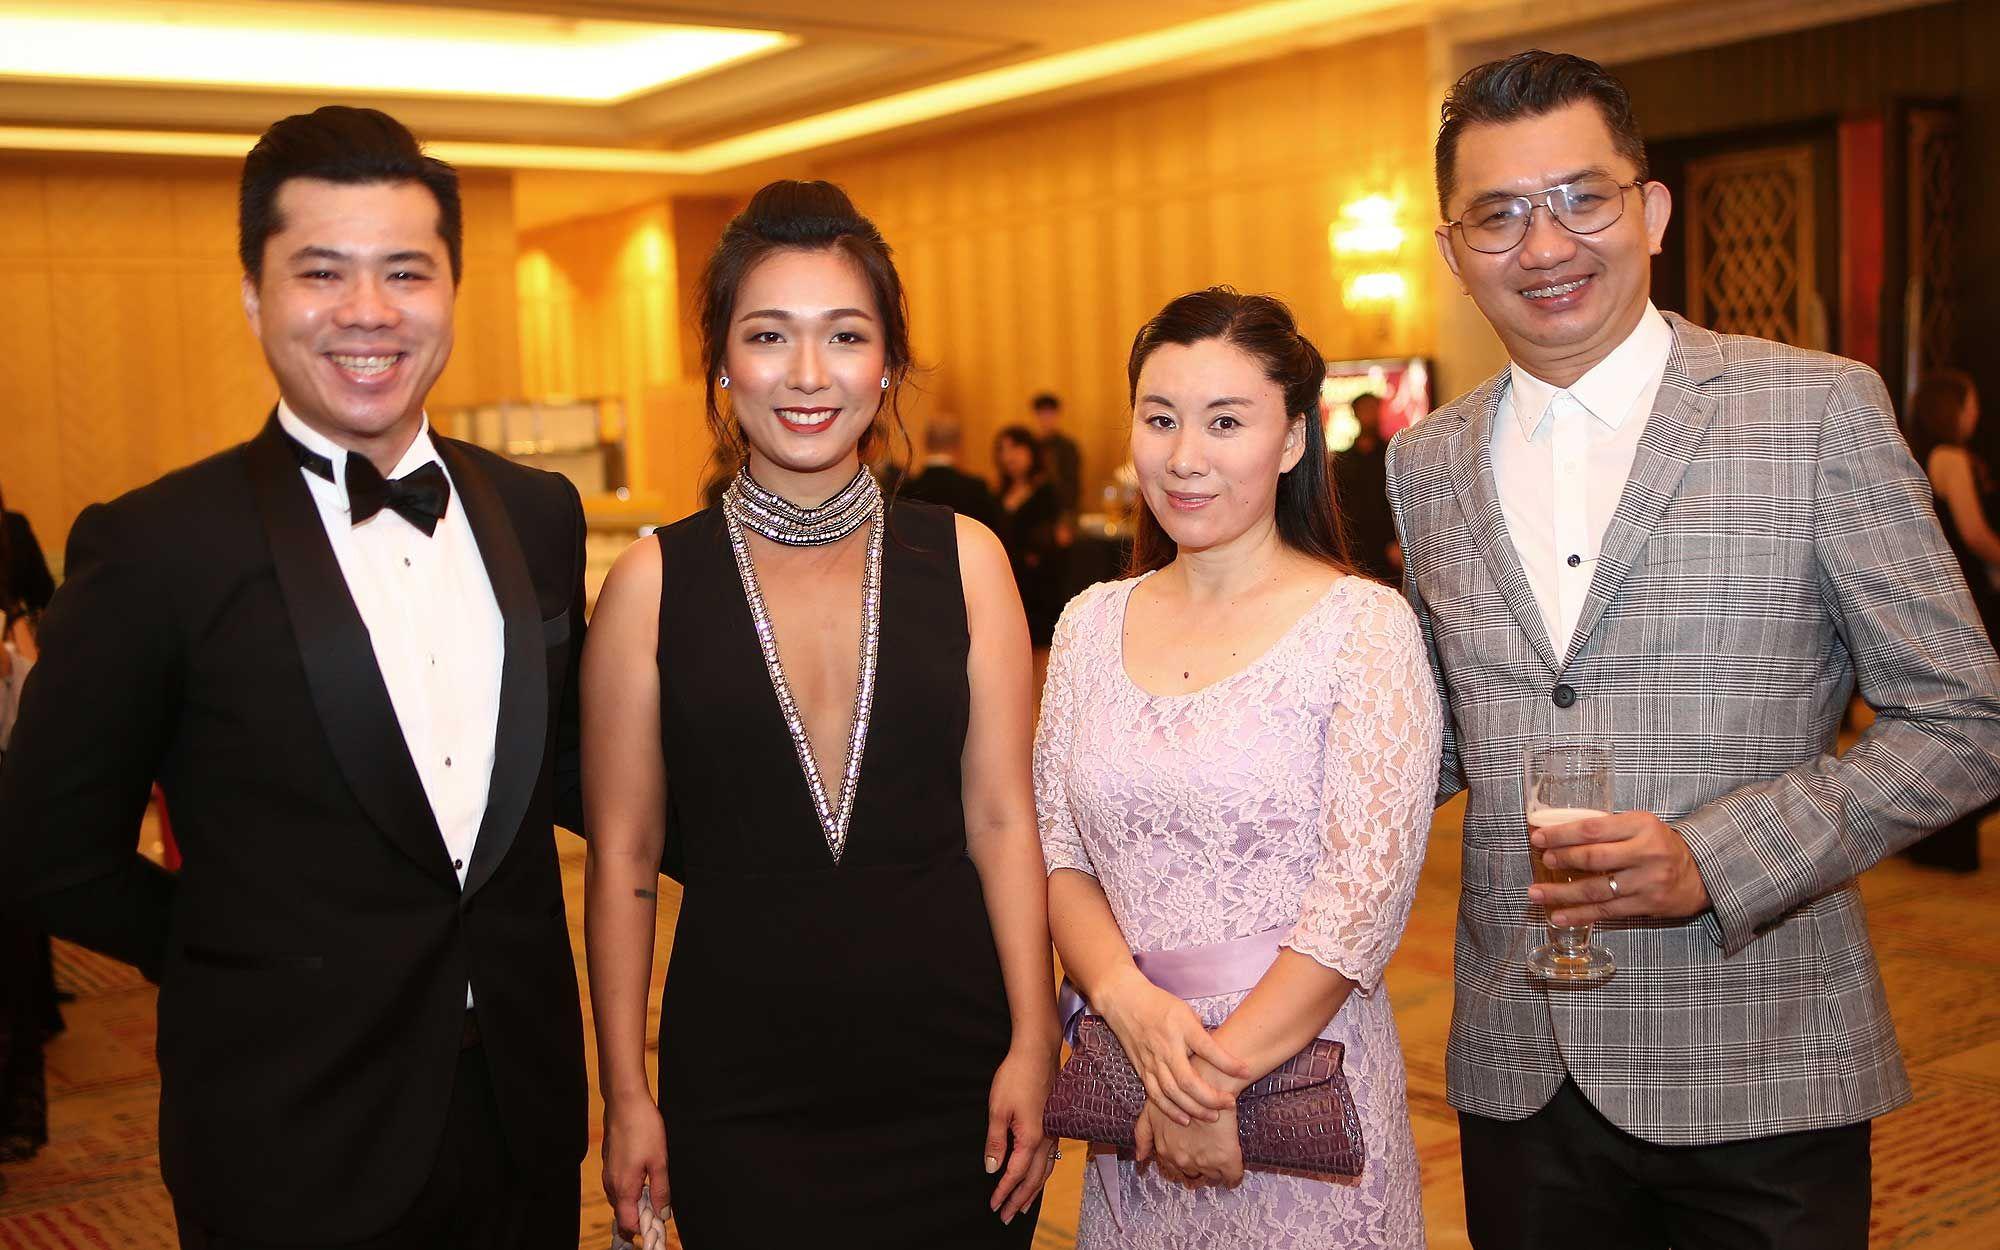 John Chai, Lee Cindy, Dong Mei and Kio Fook Khan